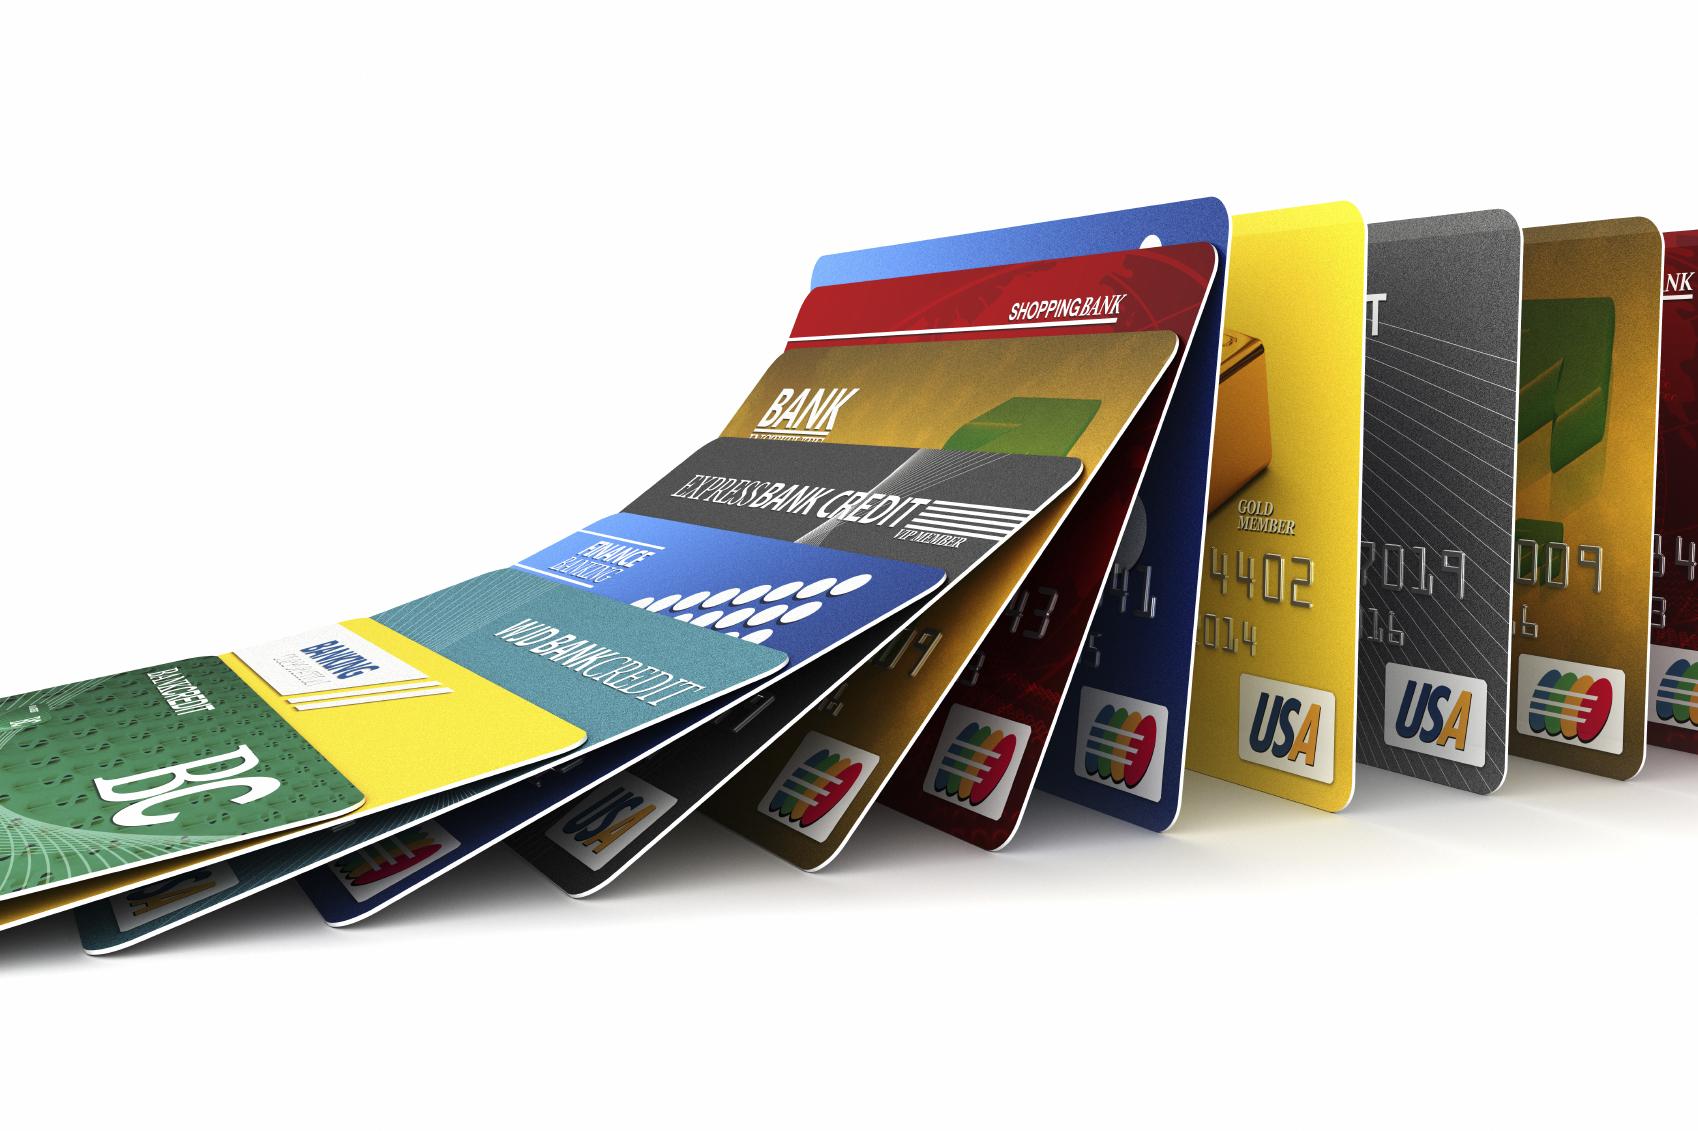 tarjeta credito finanzas